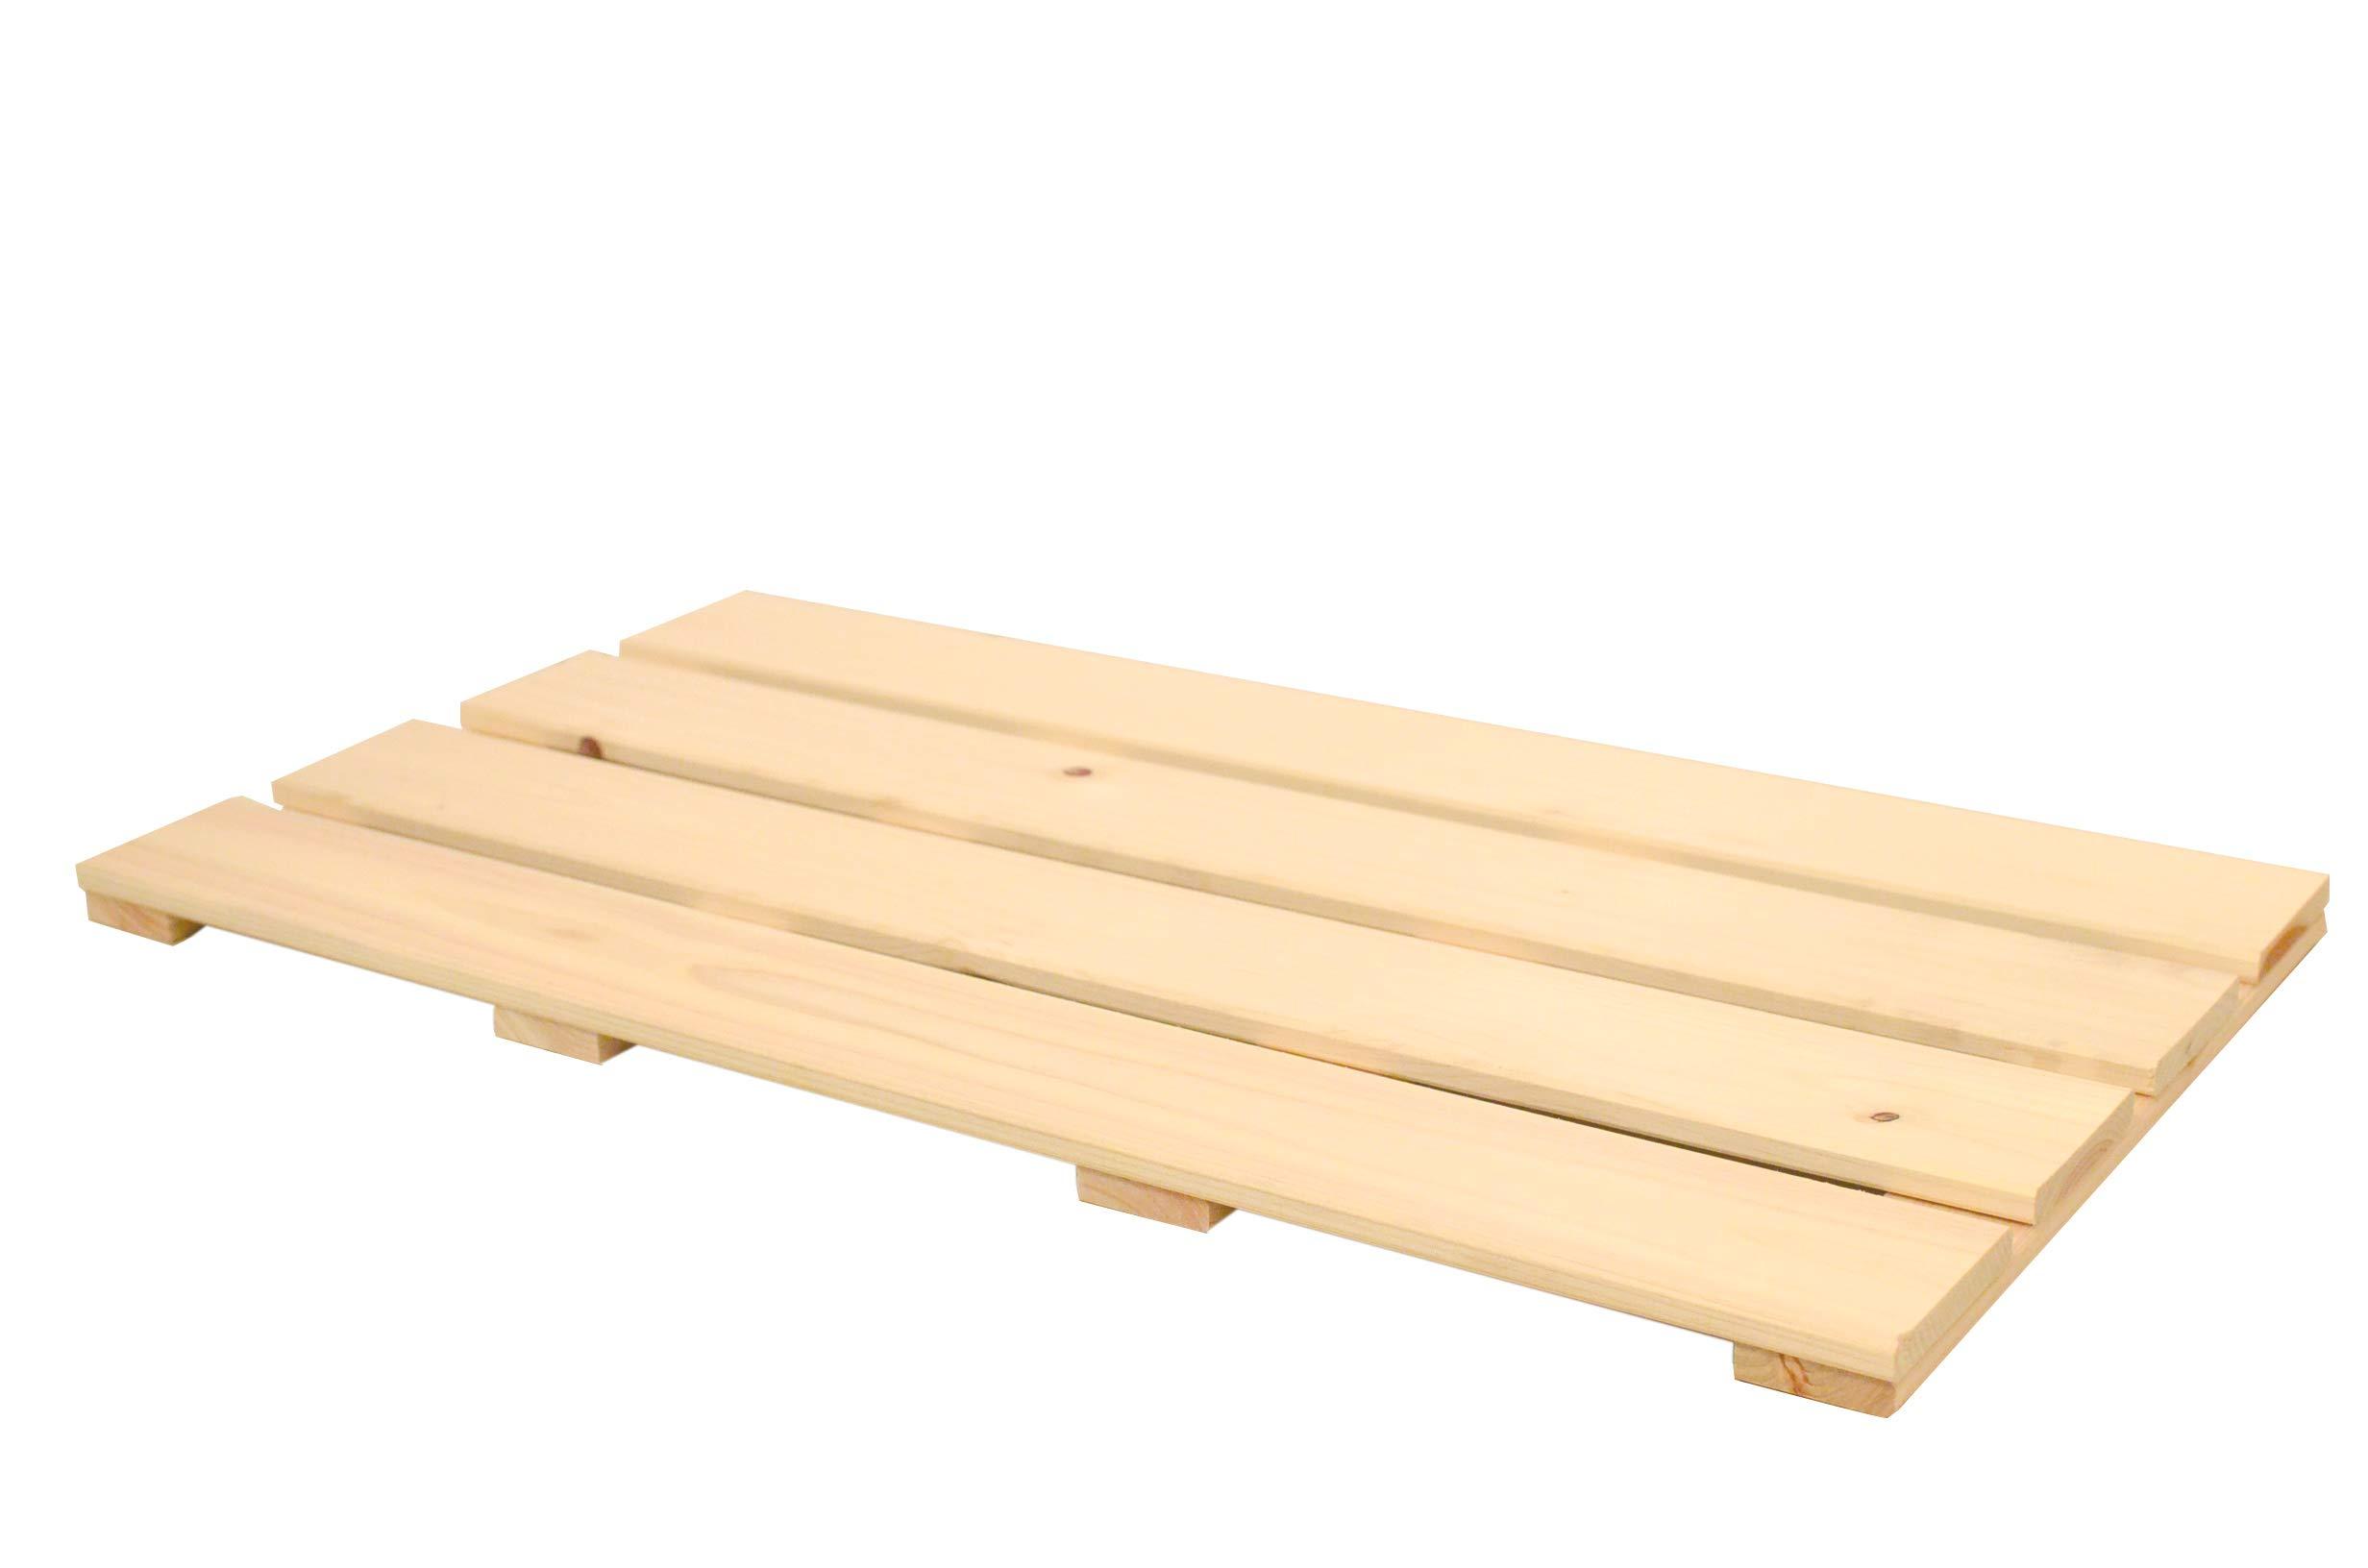 IPPINKA Hinoki Wood Shower and Bath Floor Mat, Large